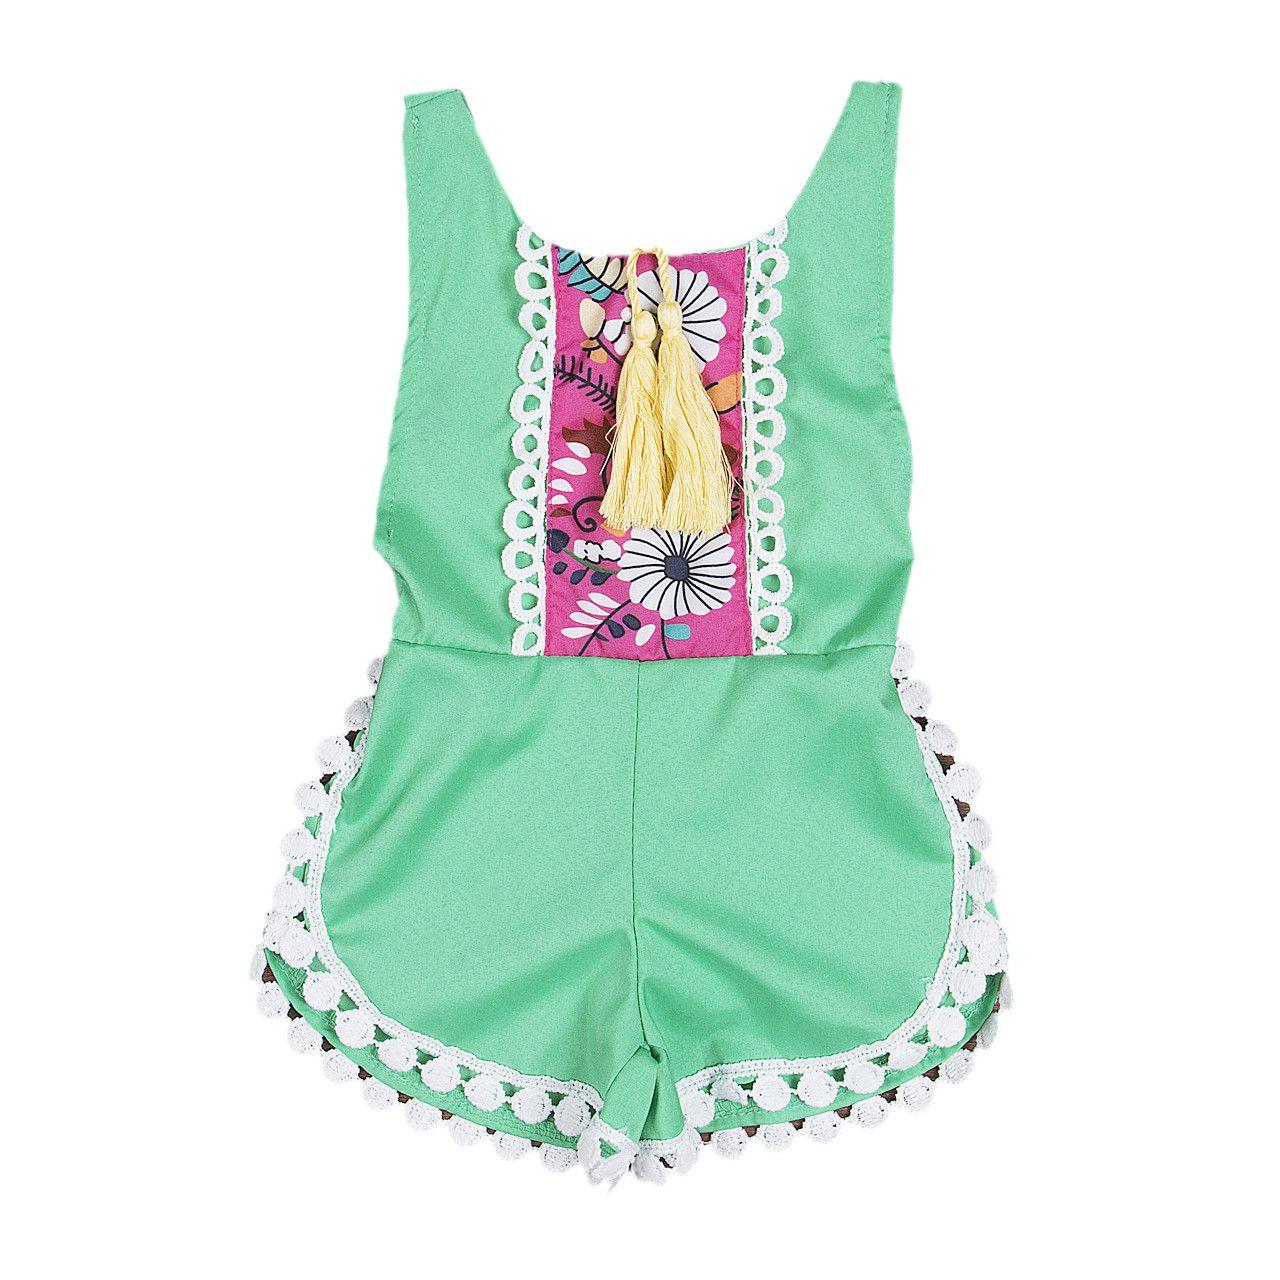 80c11c80d120 Baby Girls Rompers Toddler Kids Baby Girls Romper Belt Jumpsuit ...